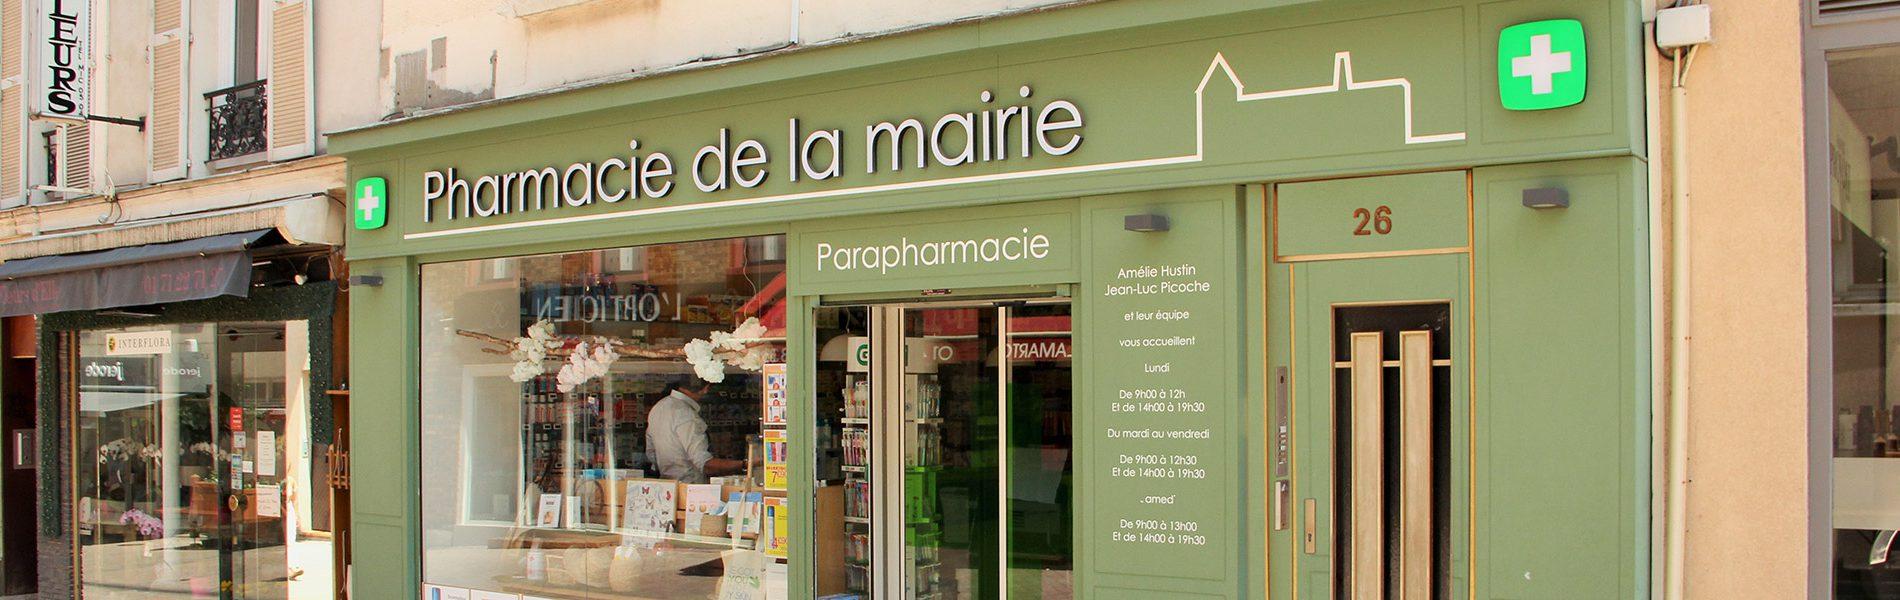 Pharmacie DE LA MAIRIE - Image Homepage 1